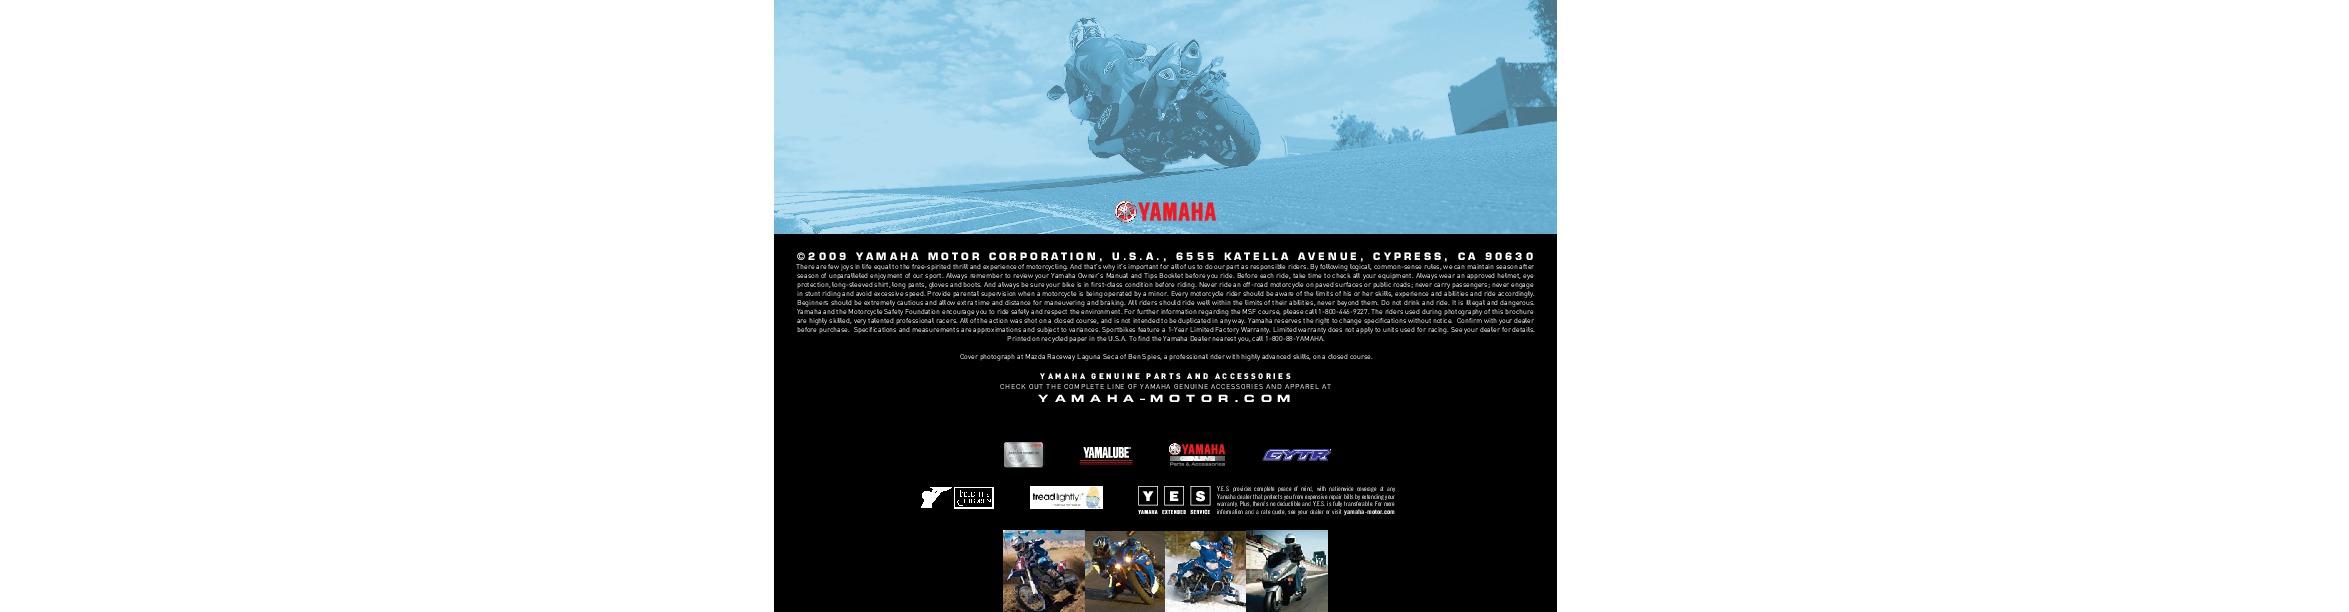 2010 Yamaha Sport Bike Yzf R1 R6 Fz1 6r Fjr1300a Catalog Yamalube Motor Oil Page 10